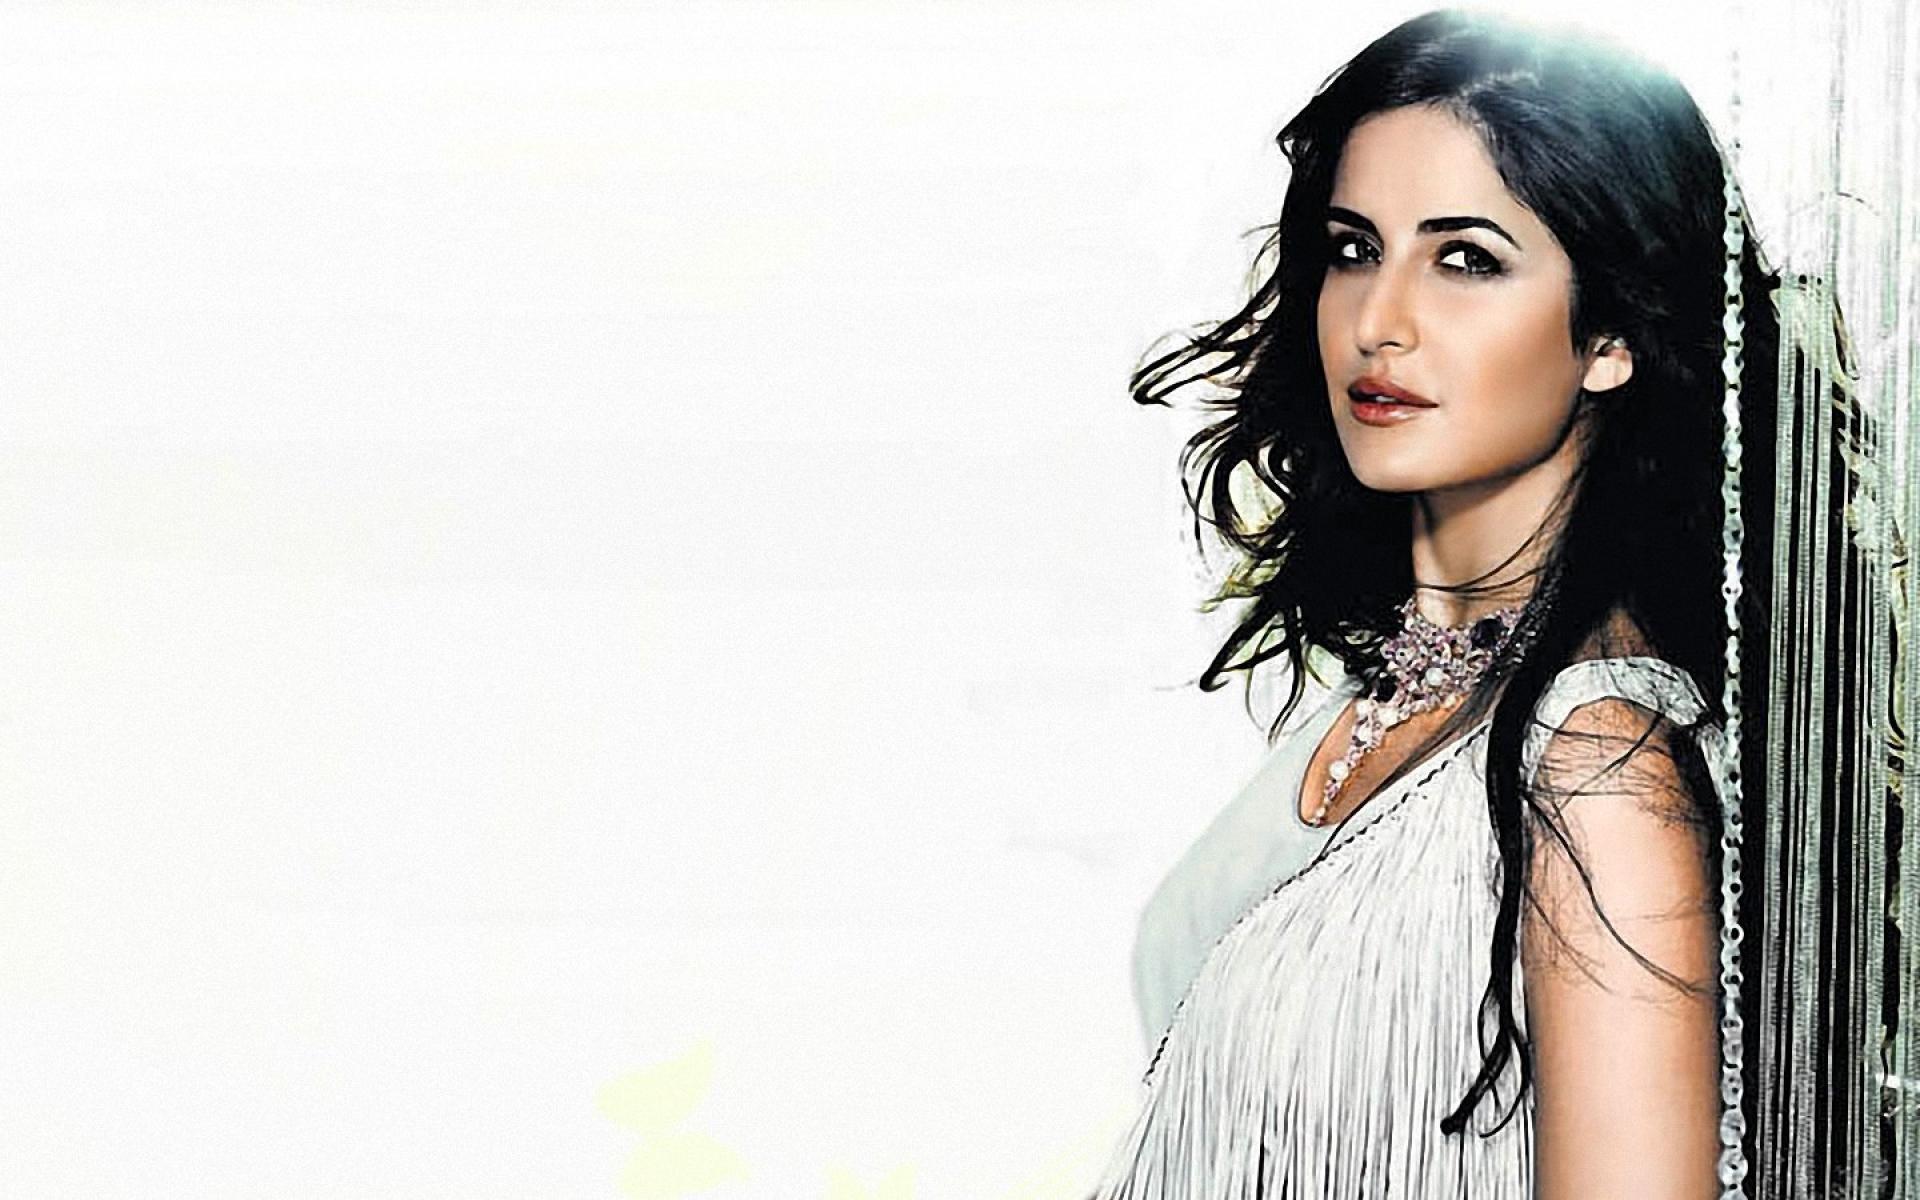 hot actress katrina kaif high definition wallpaper for desktop background